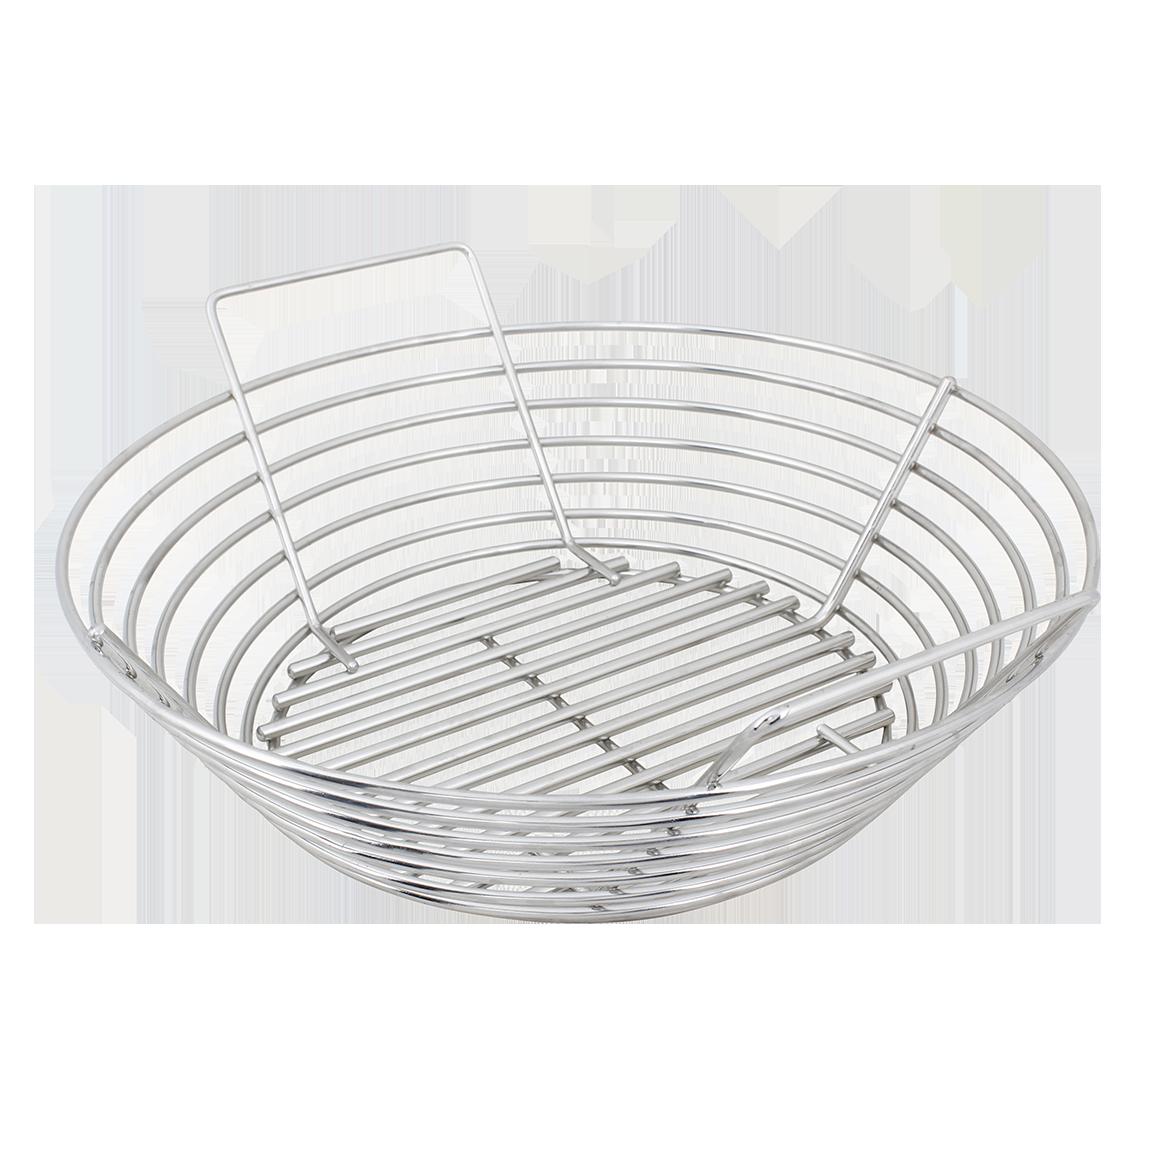 Stainless Steel Kick Ash Basket (Classic Joe) 00291